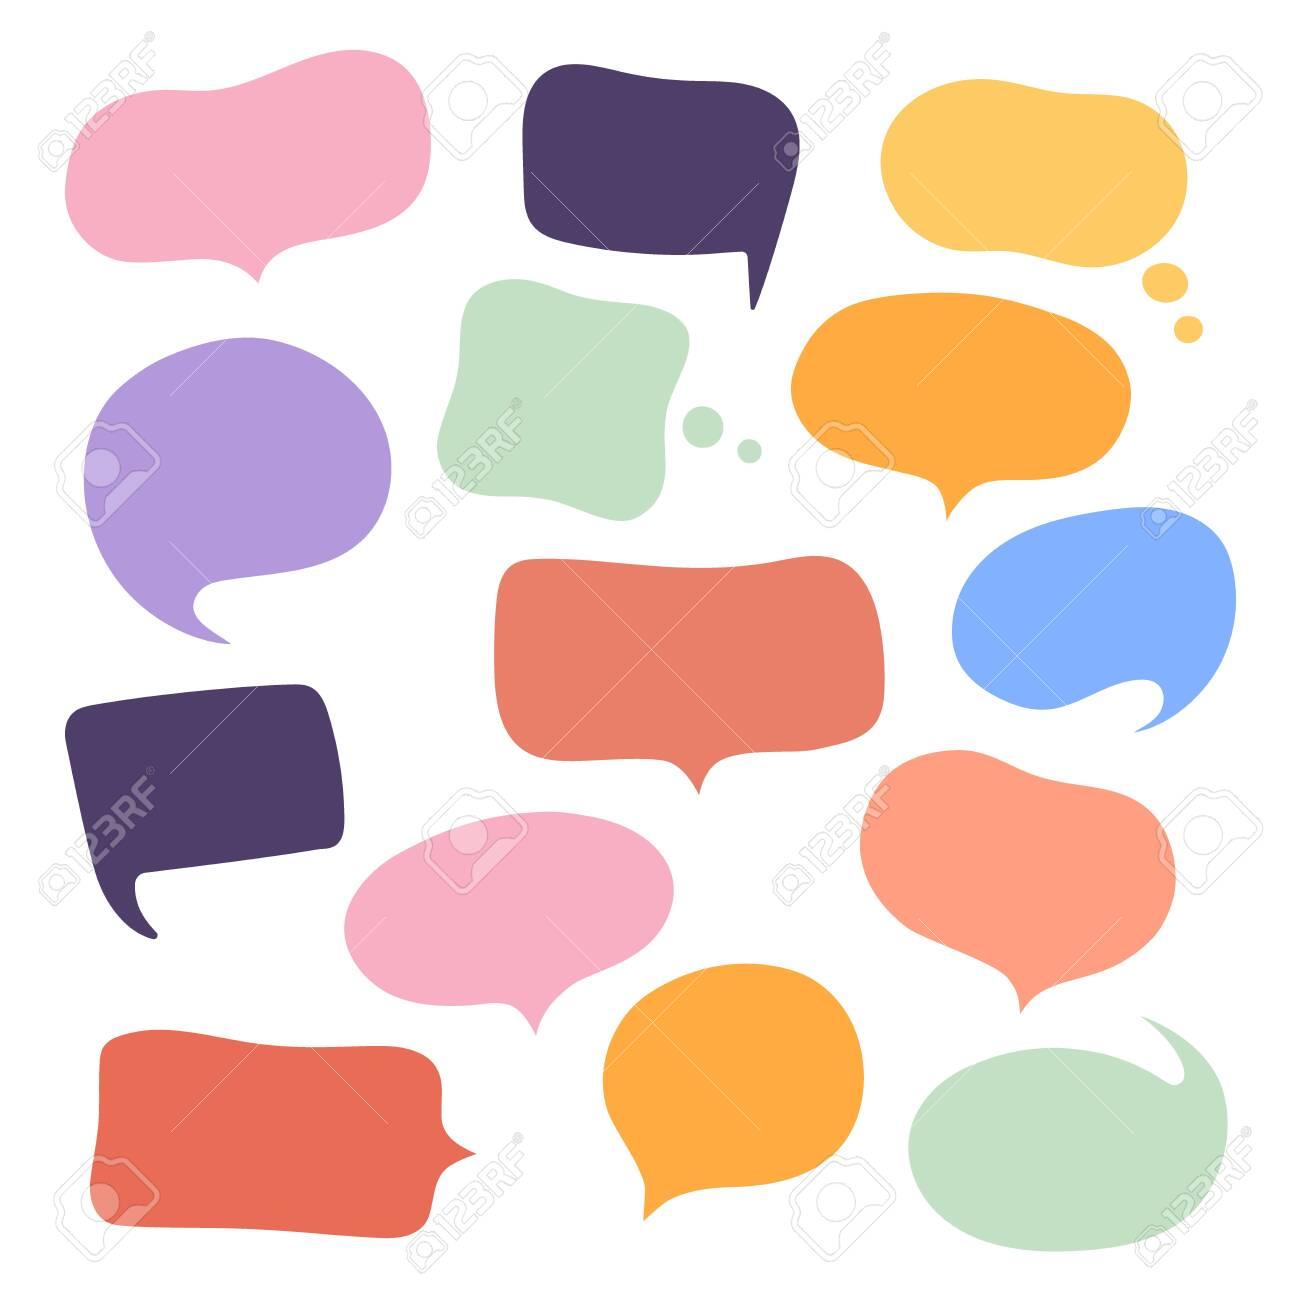 Set different hand-drawn speech bubble. Talk chat speak message. Empty blank comment. Vector illustration design. - 151571205